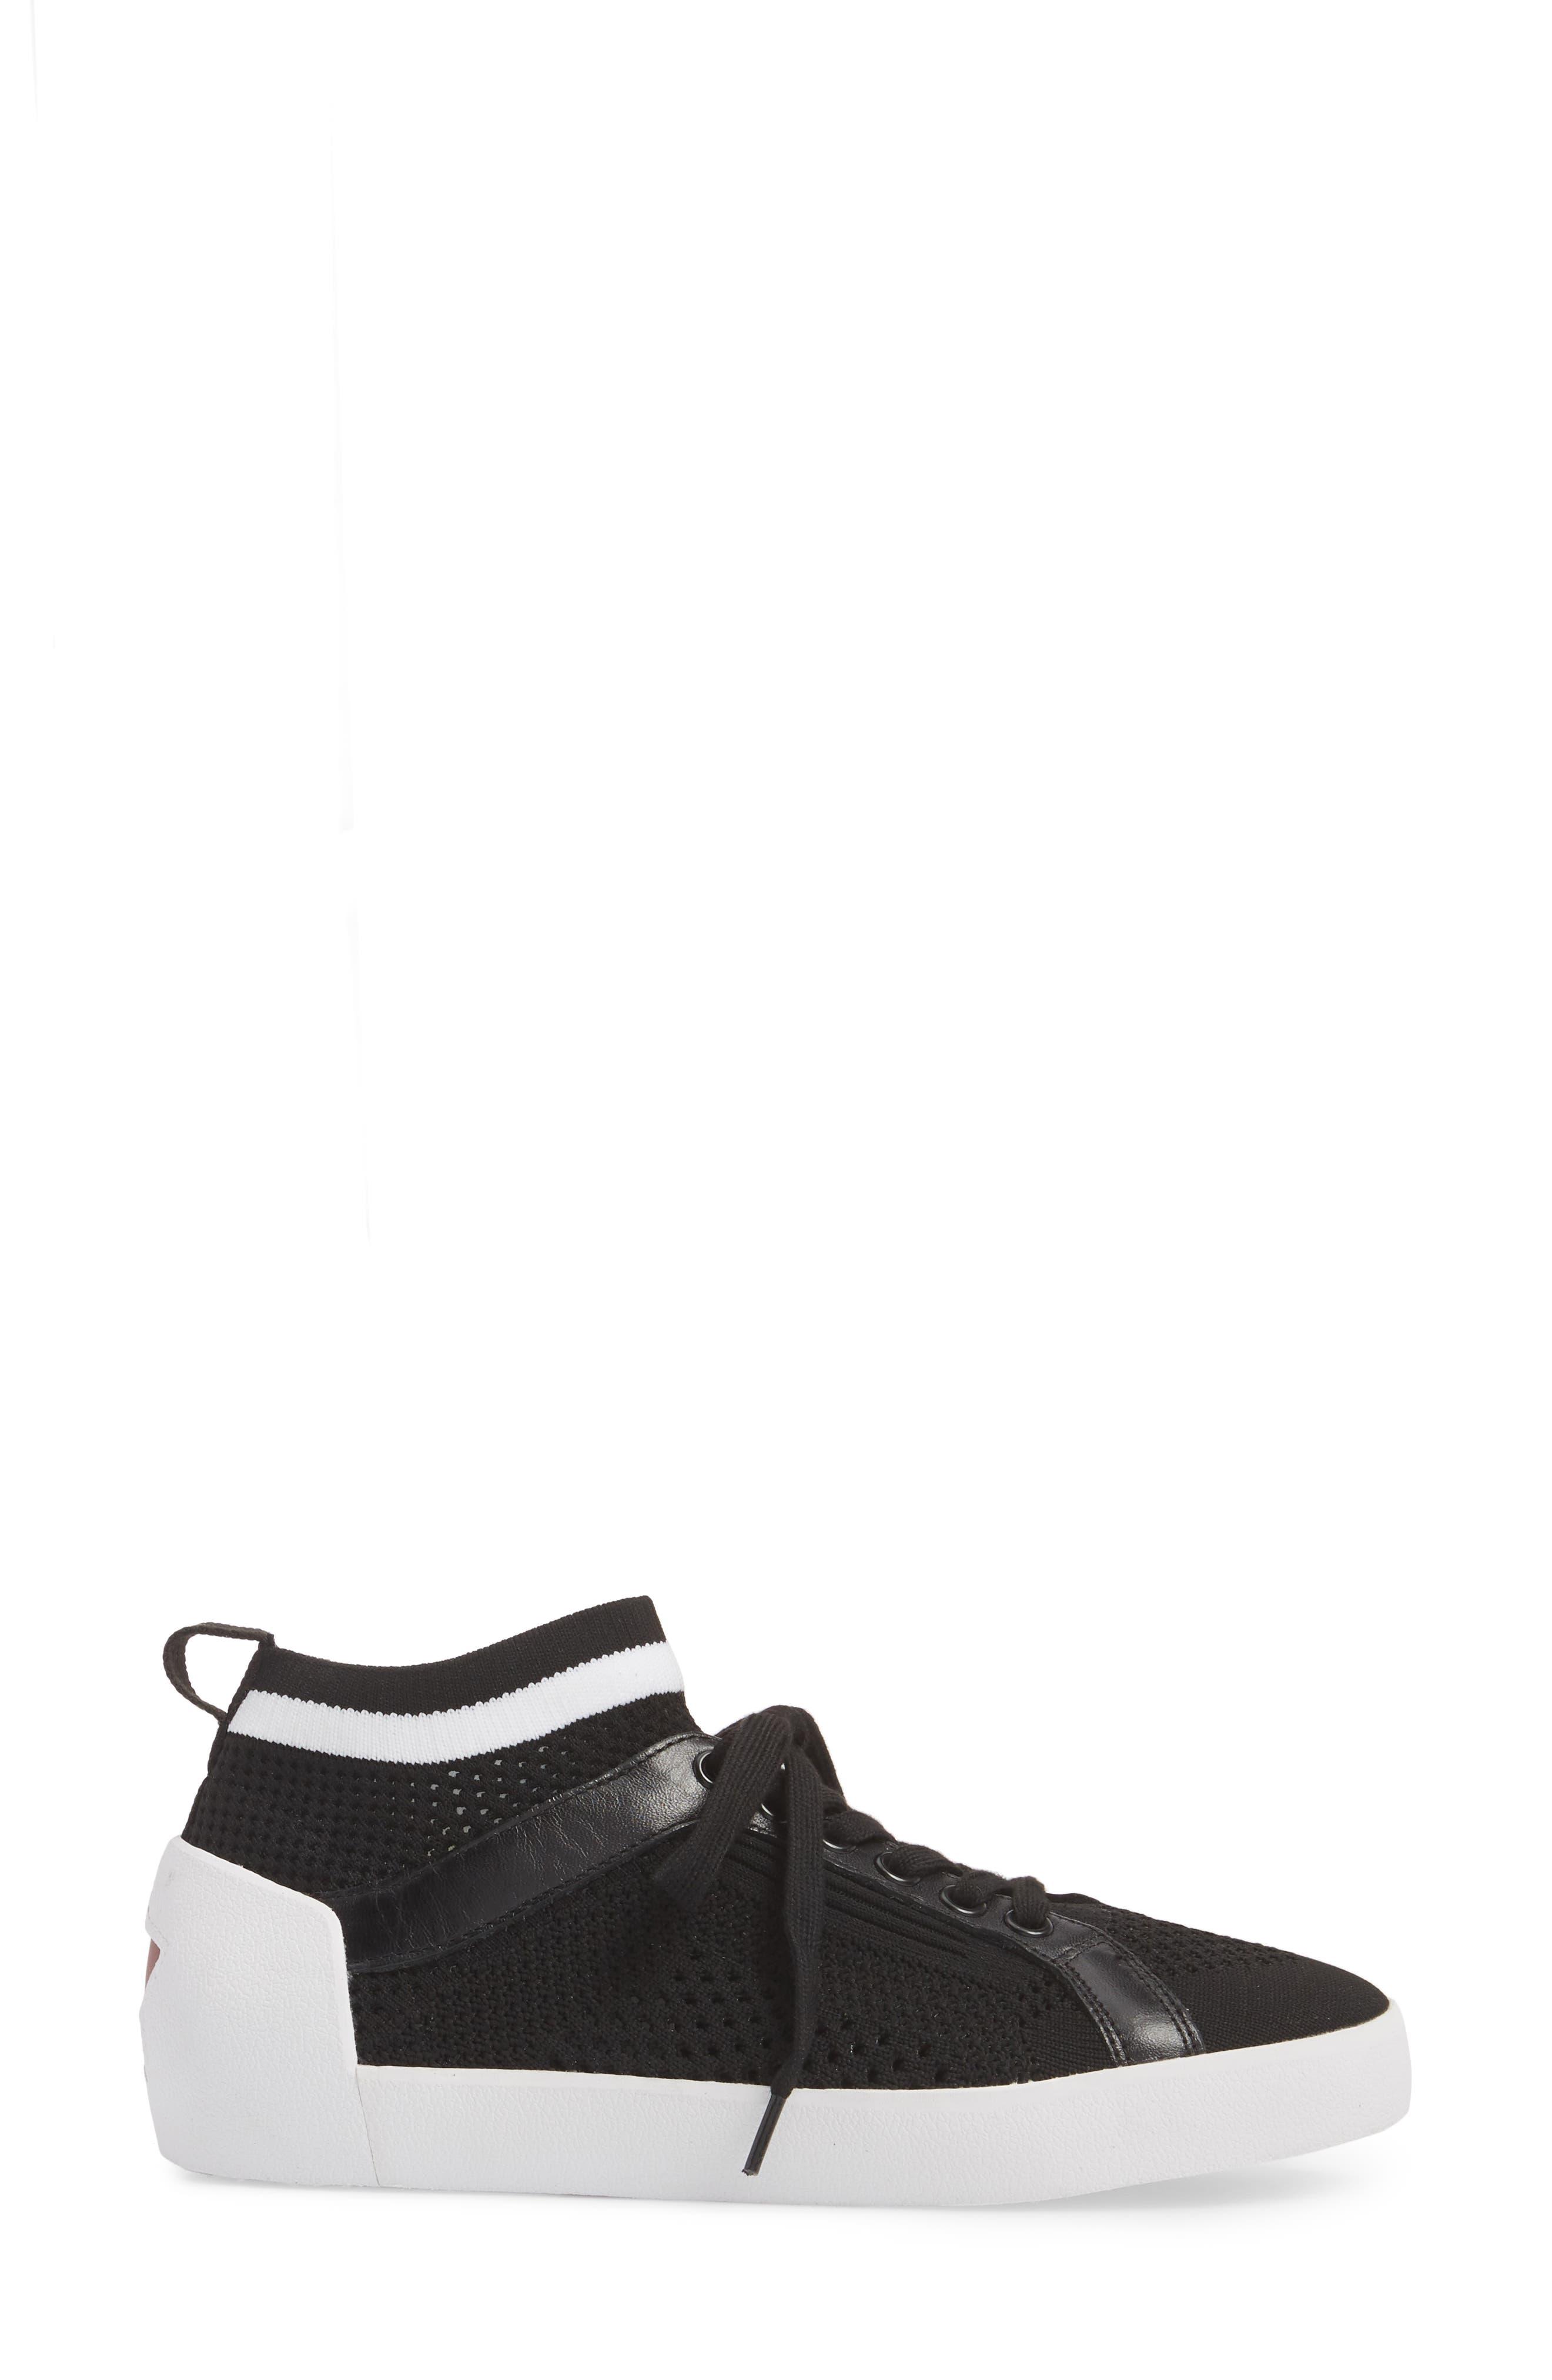 Nolita Mid Top Sock Sneaker,                             Alternate thumbnail 3, color,                             001